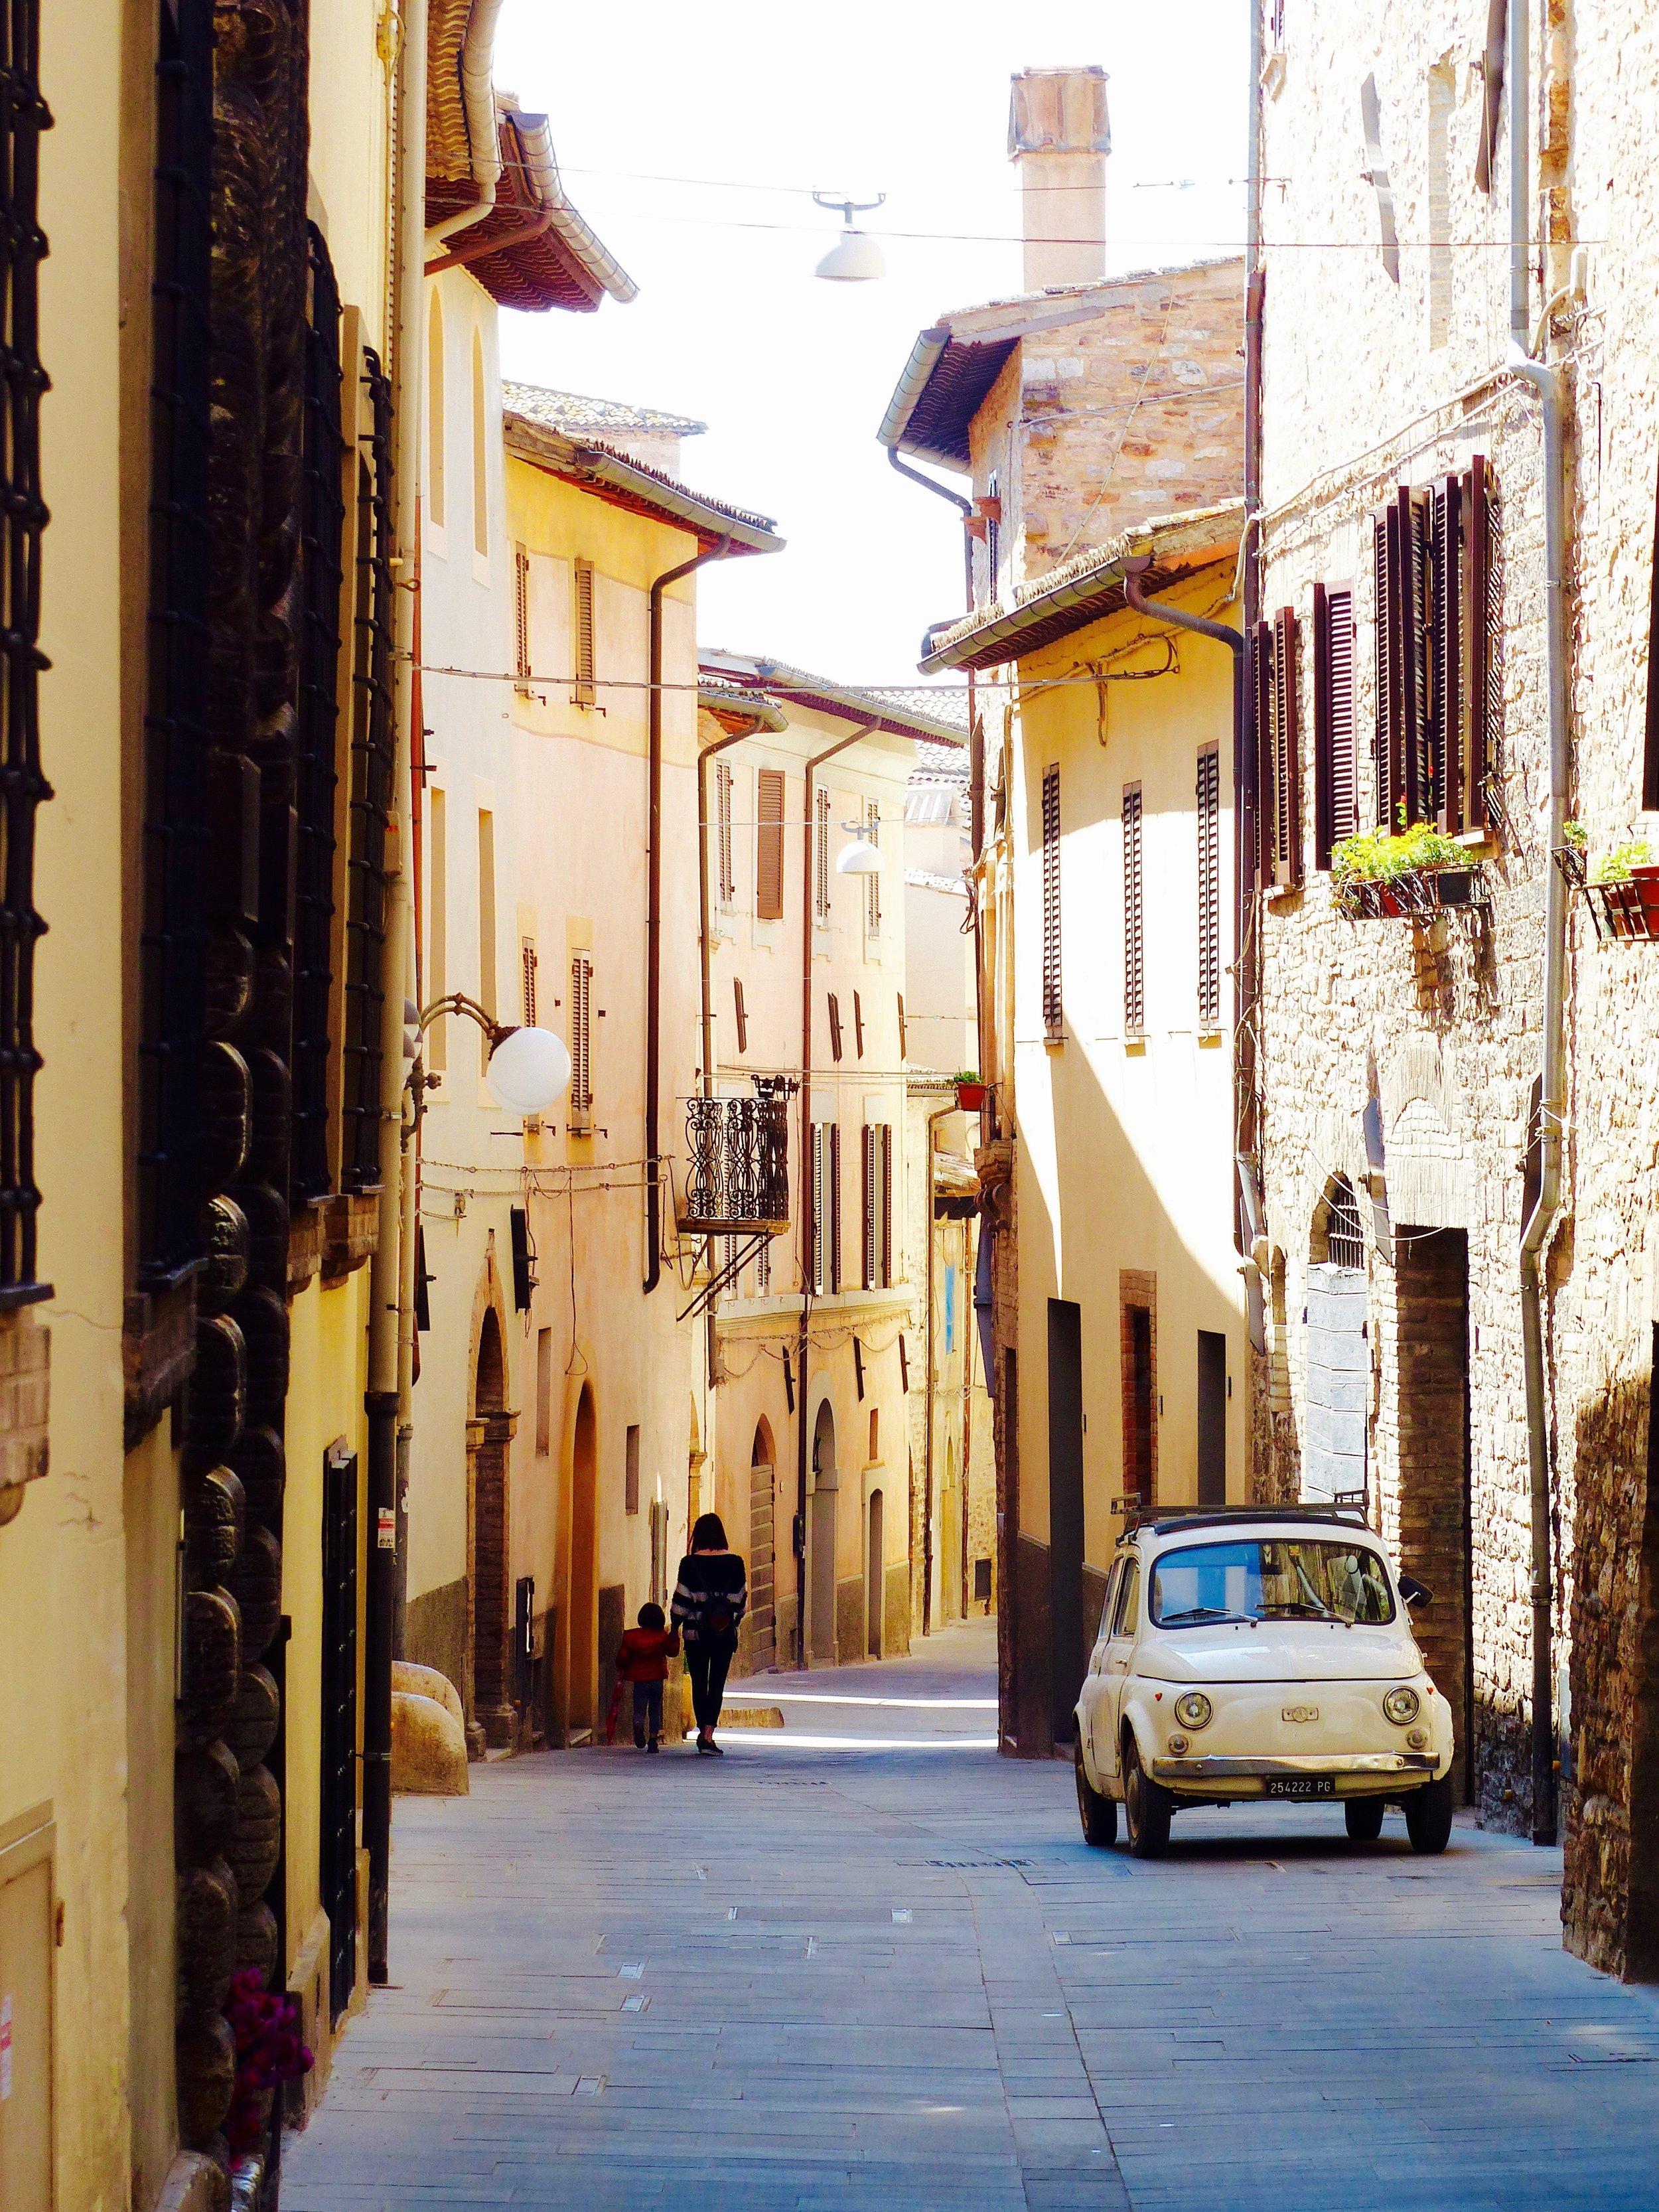 fiat on narrow street in  Spello, Umbria